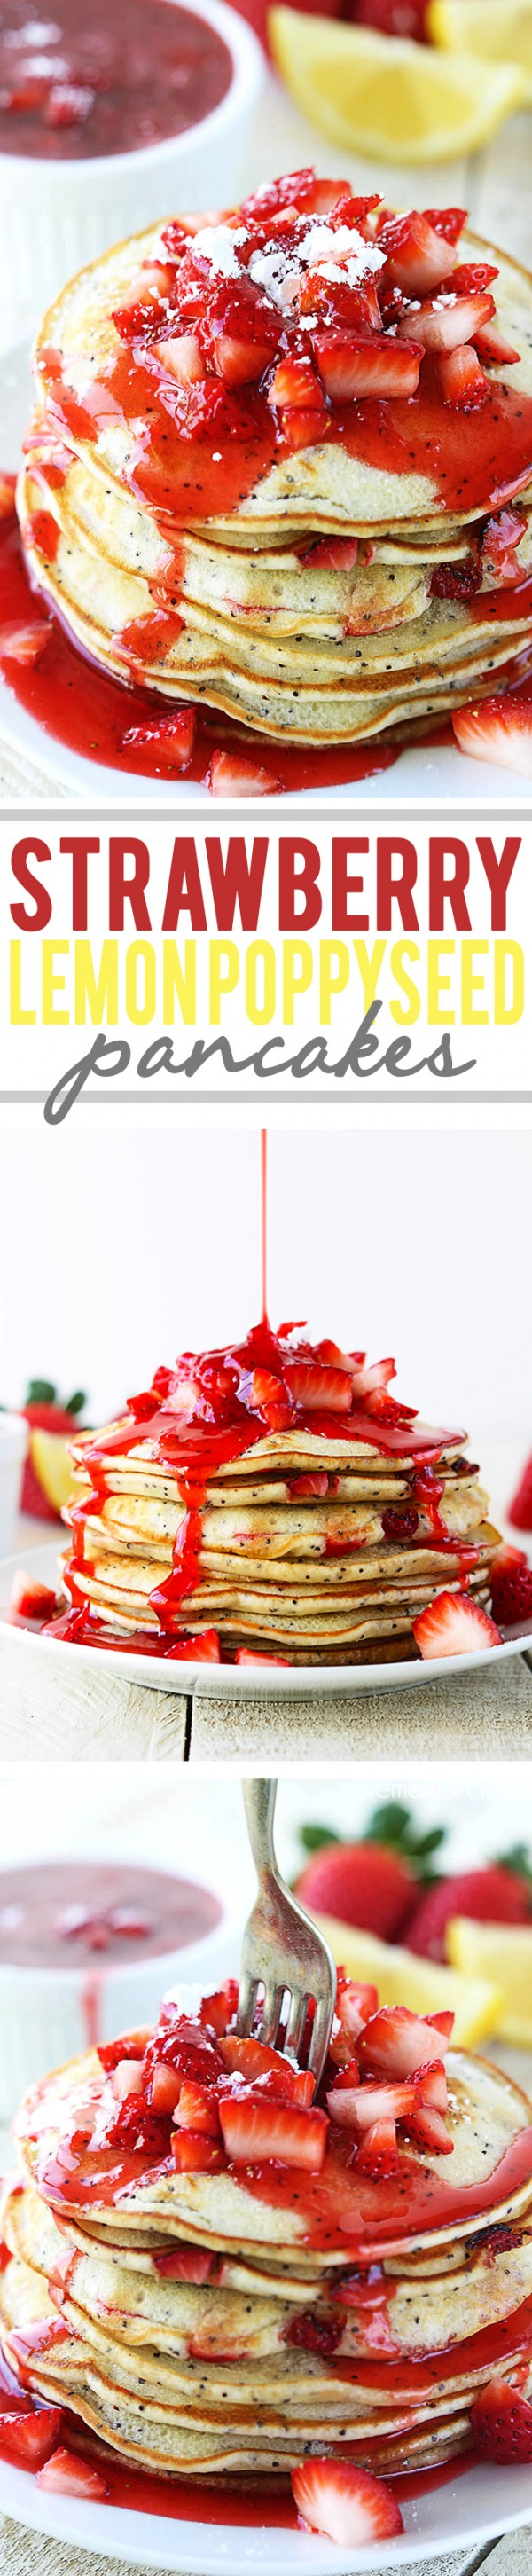 Get the recipe Strawberry Lemon Poppyseed Pancakes @recipes_to_go